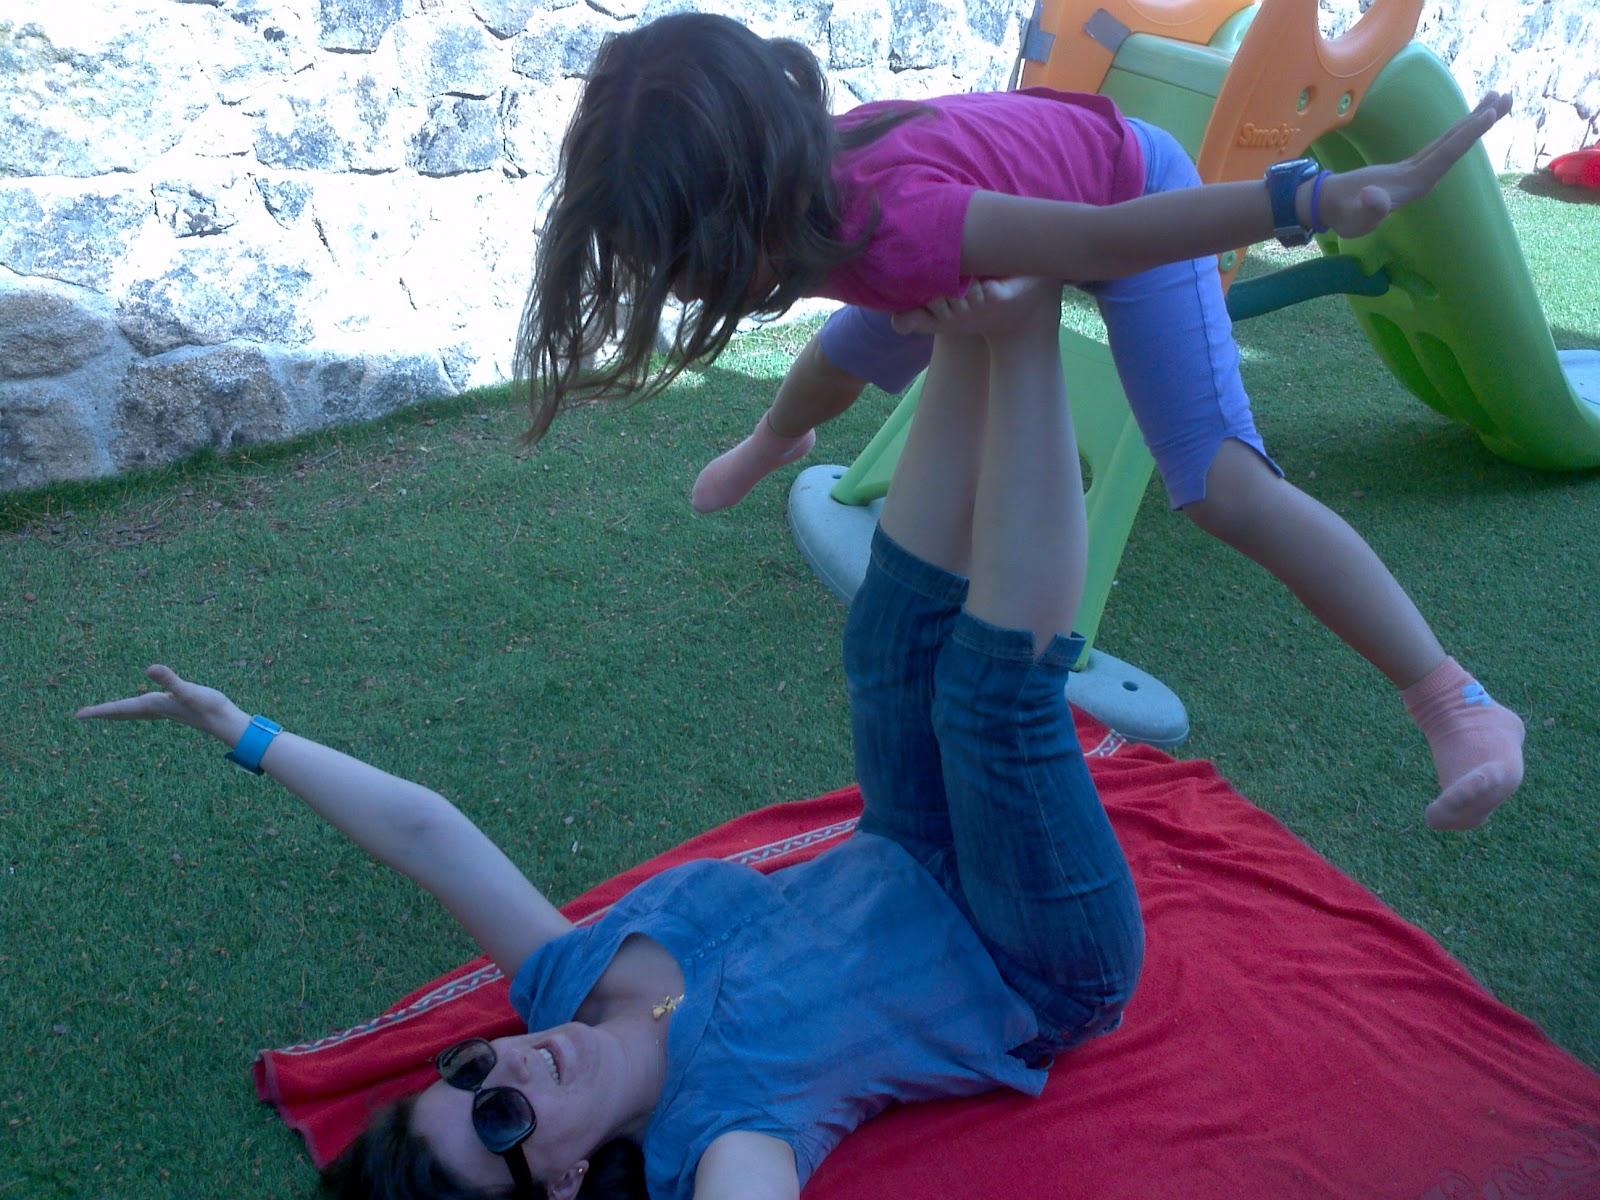 crianza respeto jugar aprender ser padres